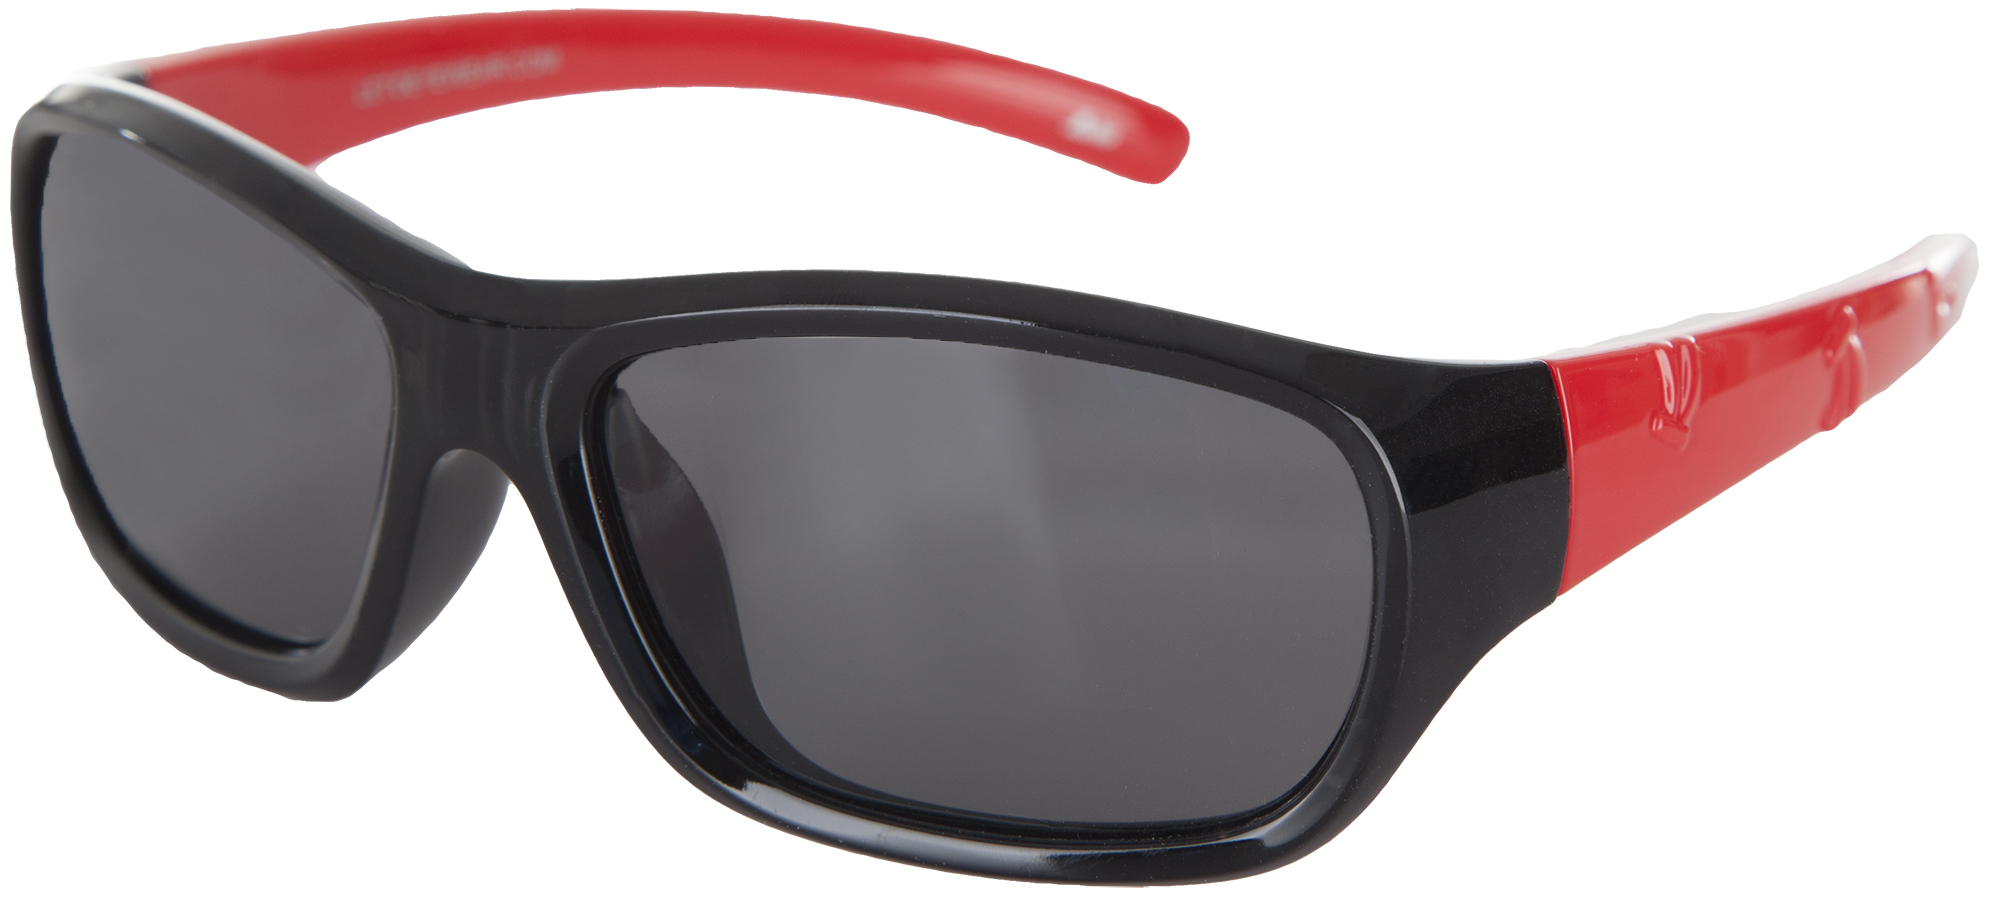 Leto Солнцезащитные очки детские Leto солнцезащитные очки bikkembergs очки солнцезащитные